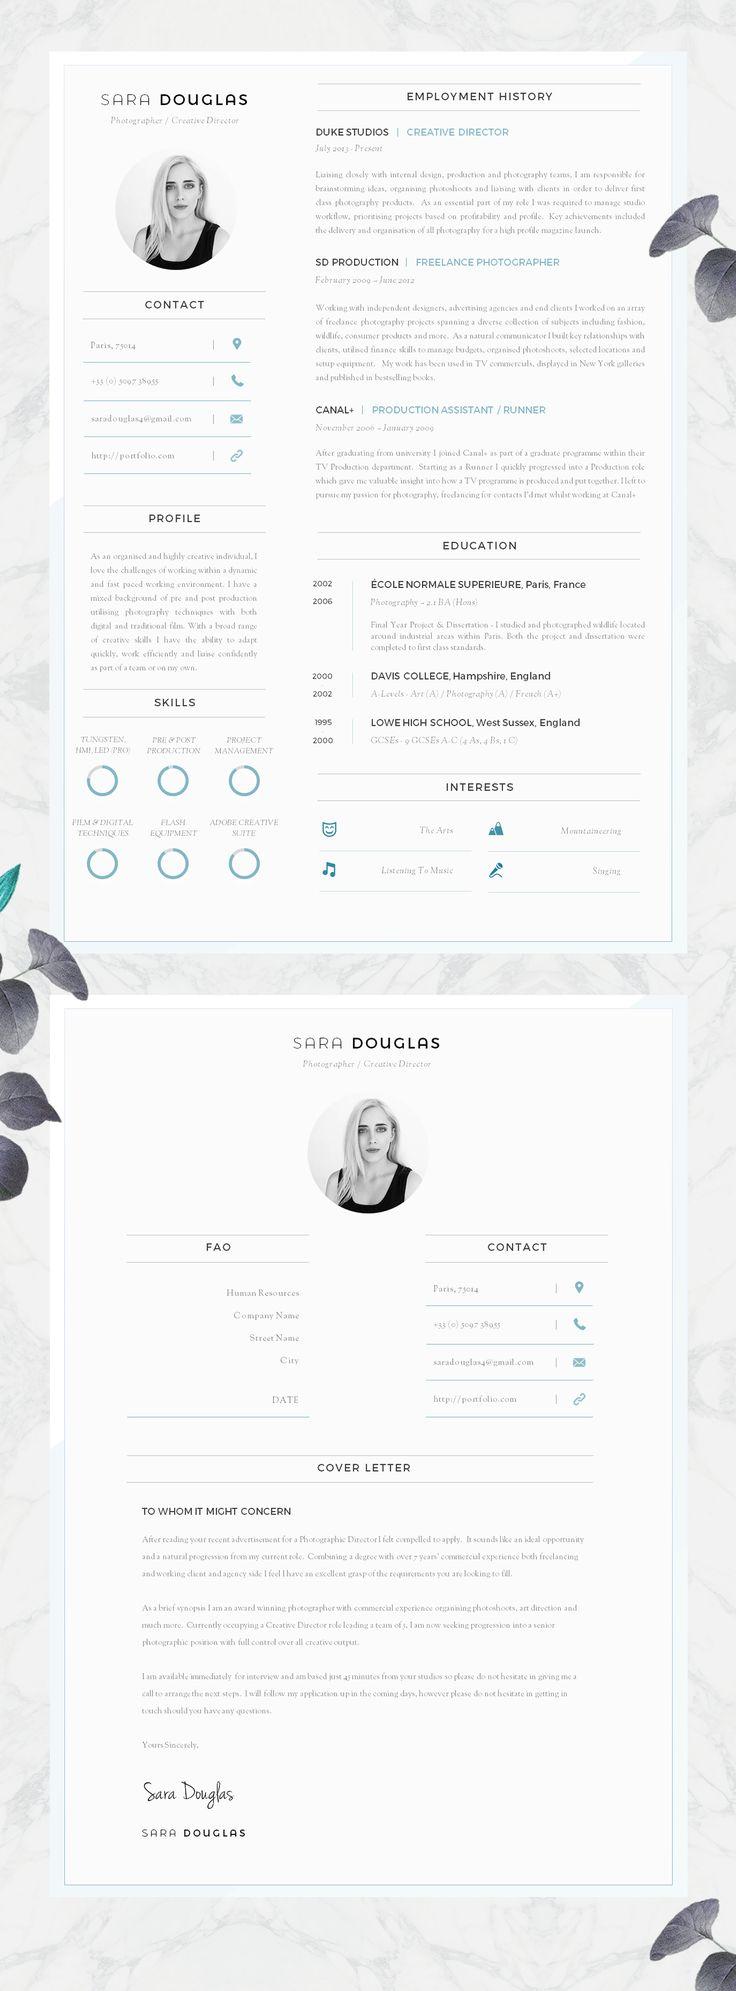 Modern CV Design | Resume Design - Must Do Career Project #Etsy #CV #Resume